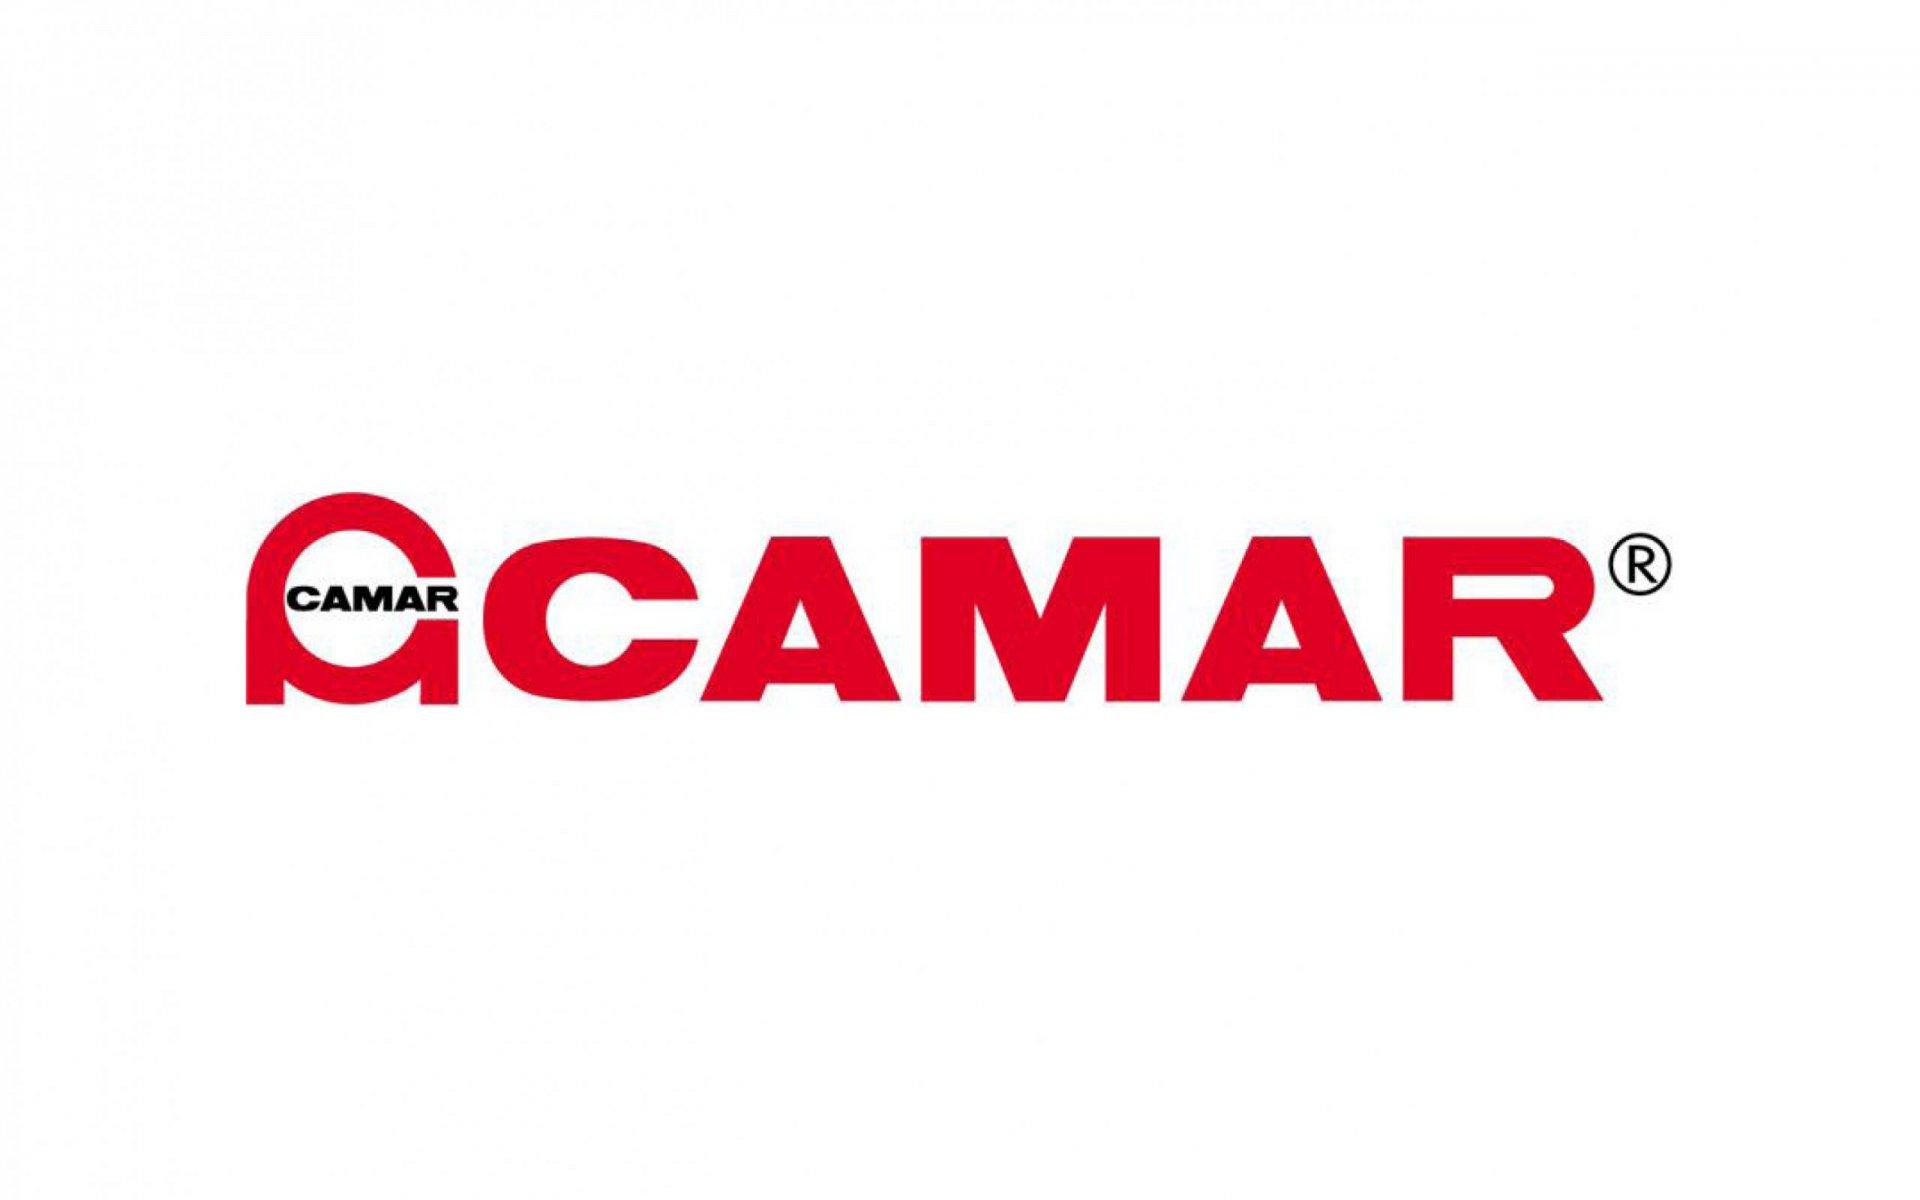 Camar-logotyp